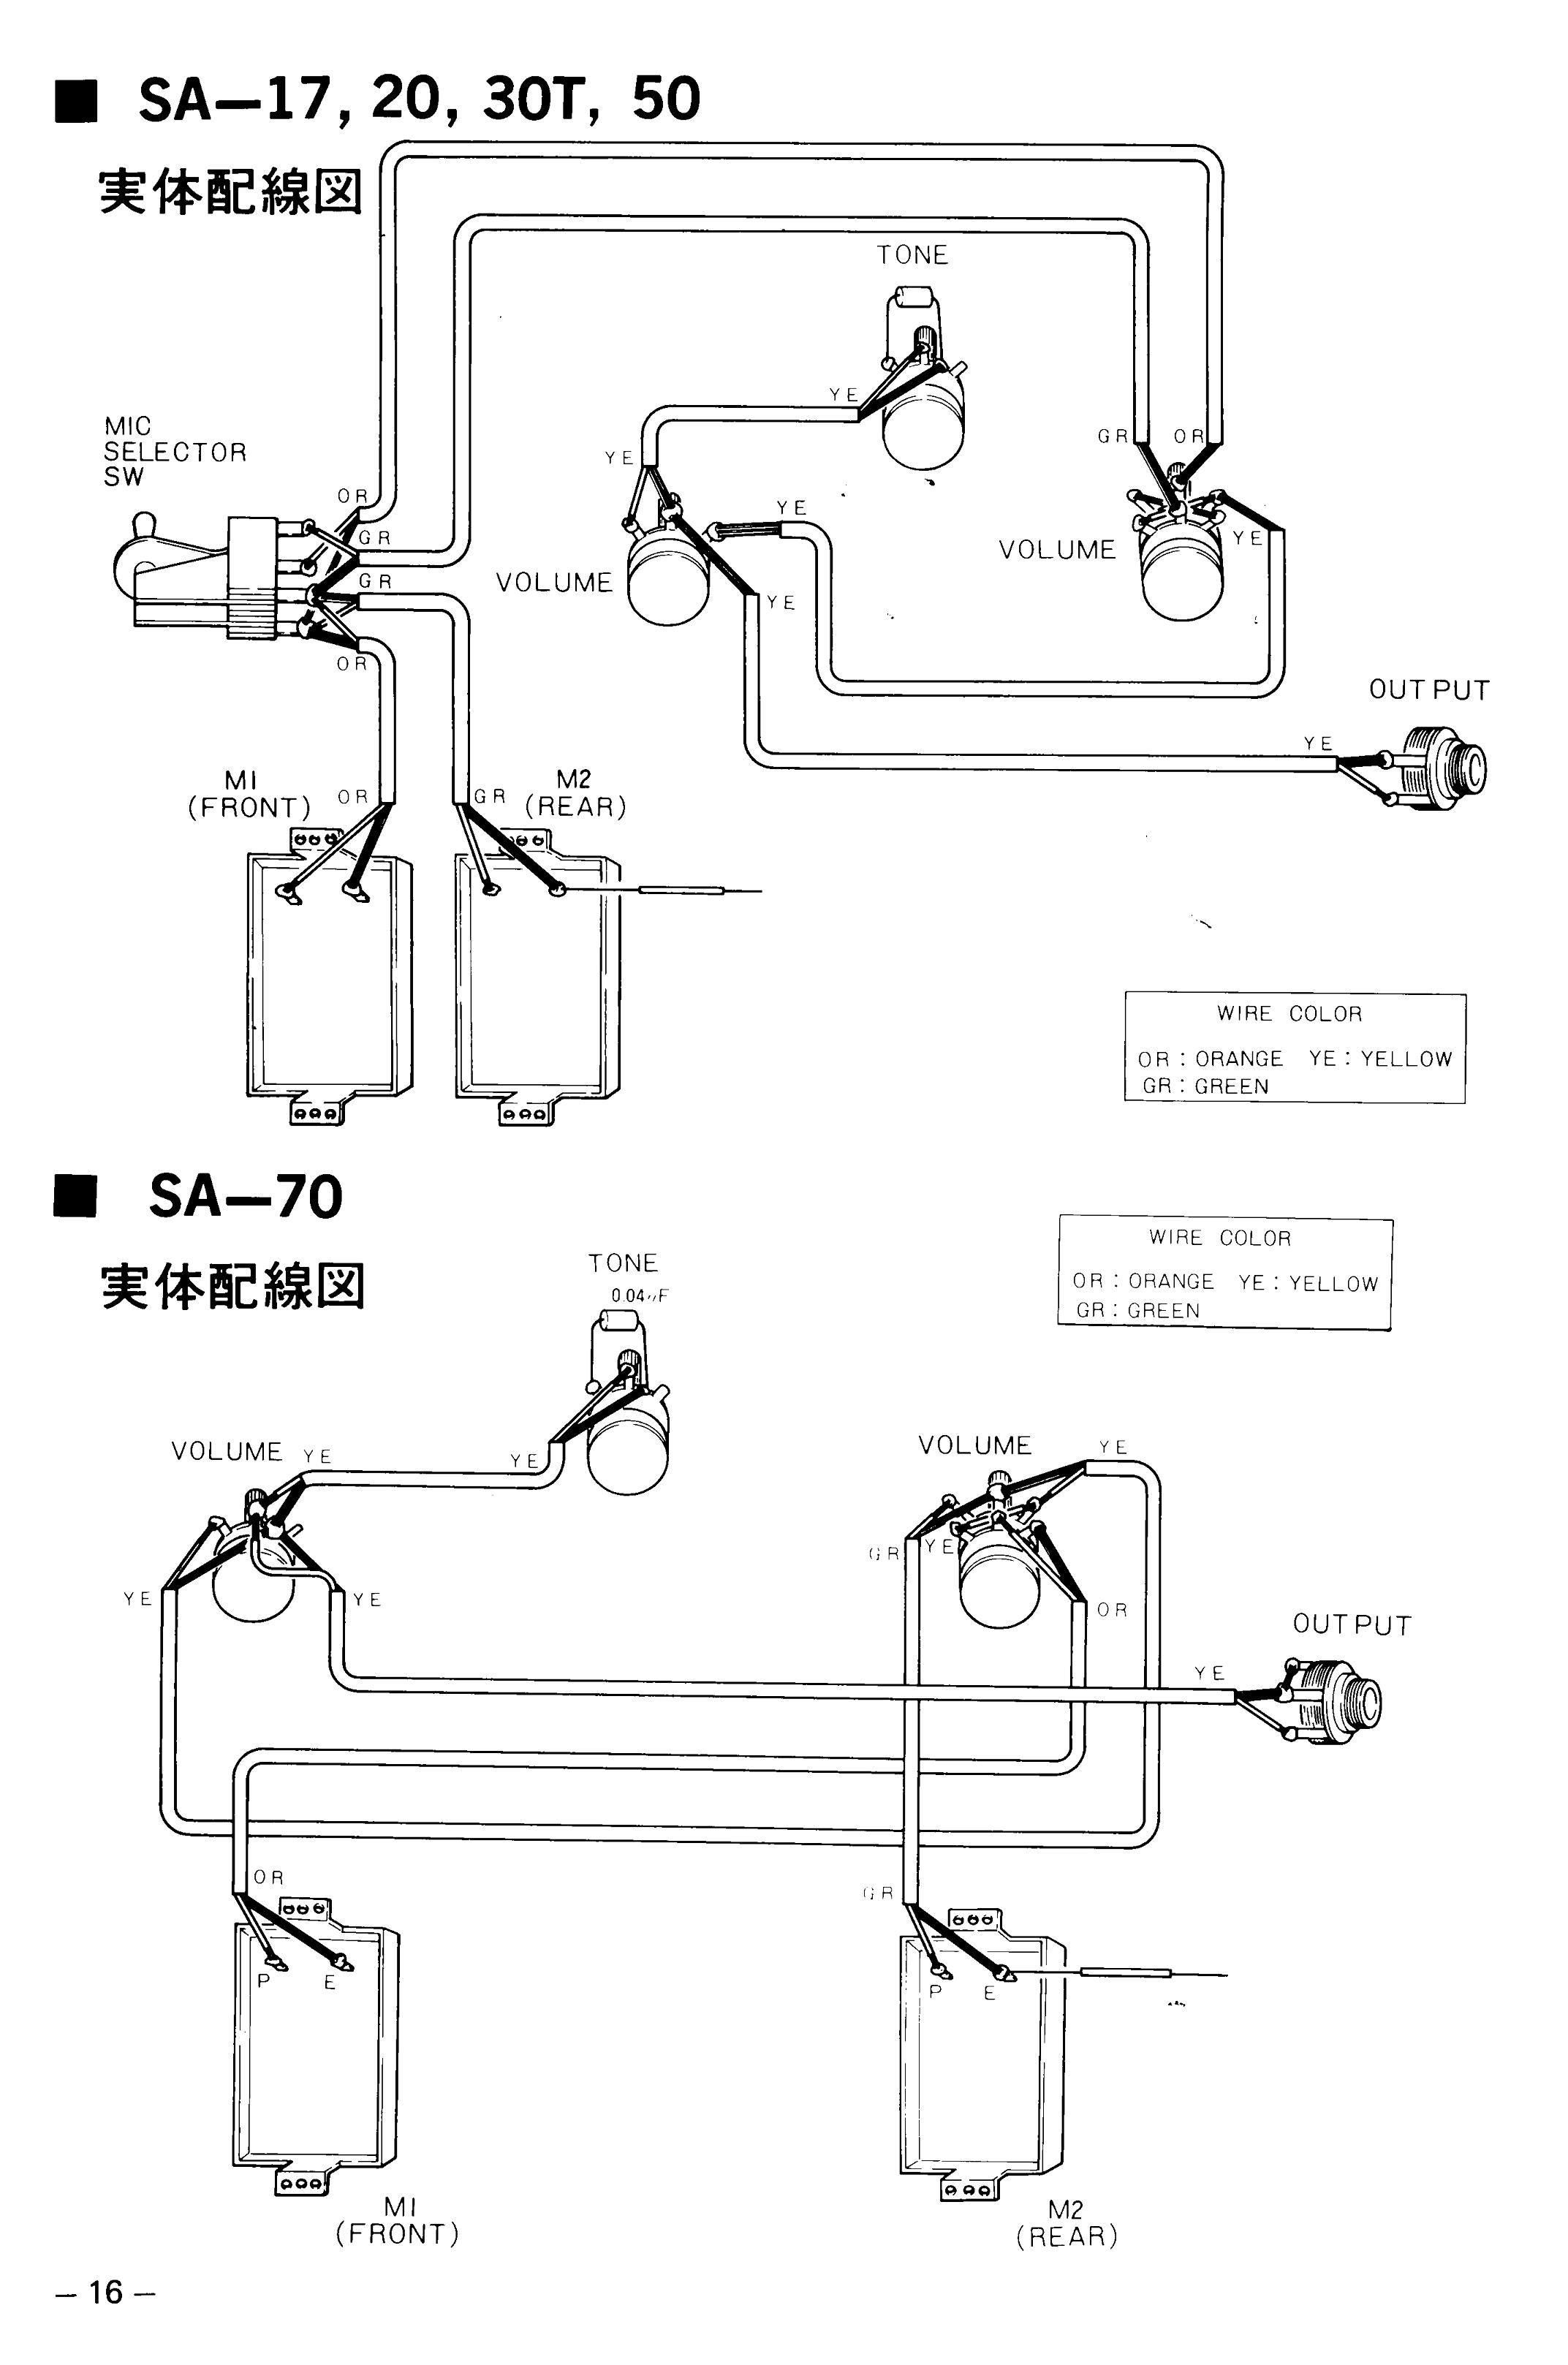 semi hollow body guitar wiring diagram everything wiring diagram semi hollow body guitar wiring diagram wiring [ 2145 x 3235 Pixel ]